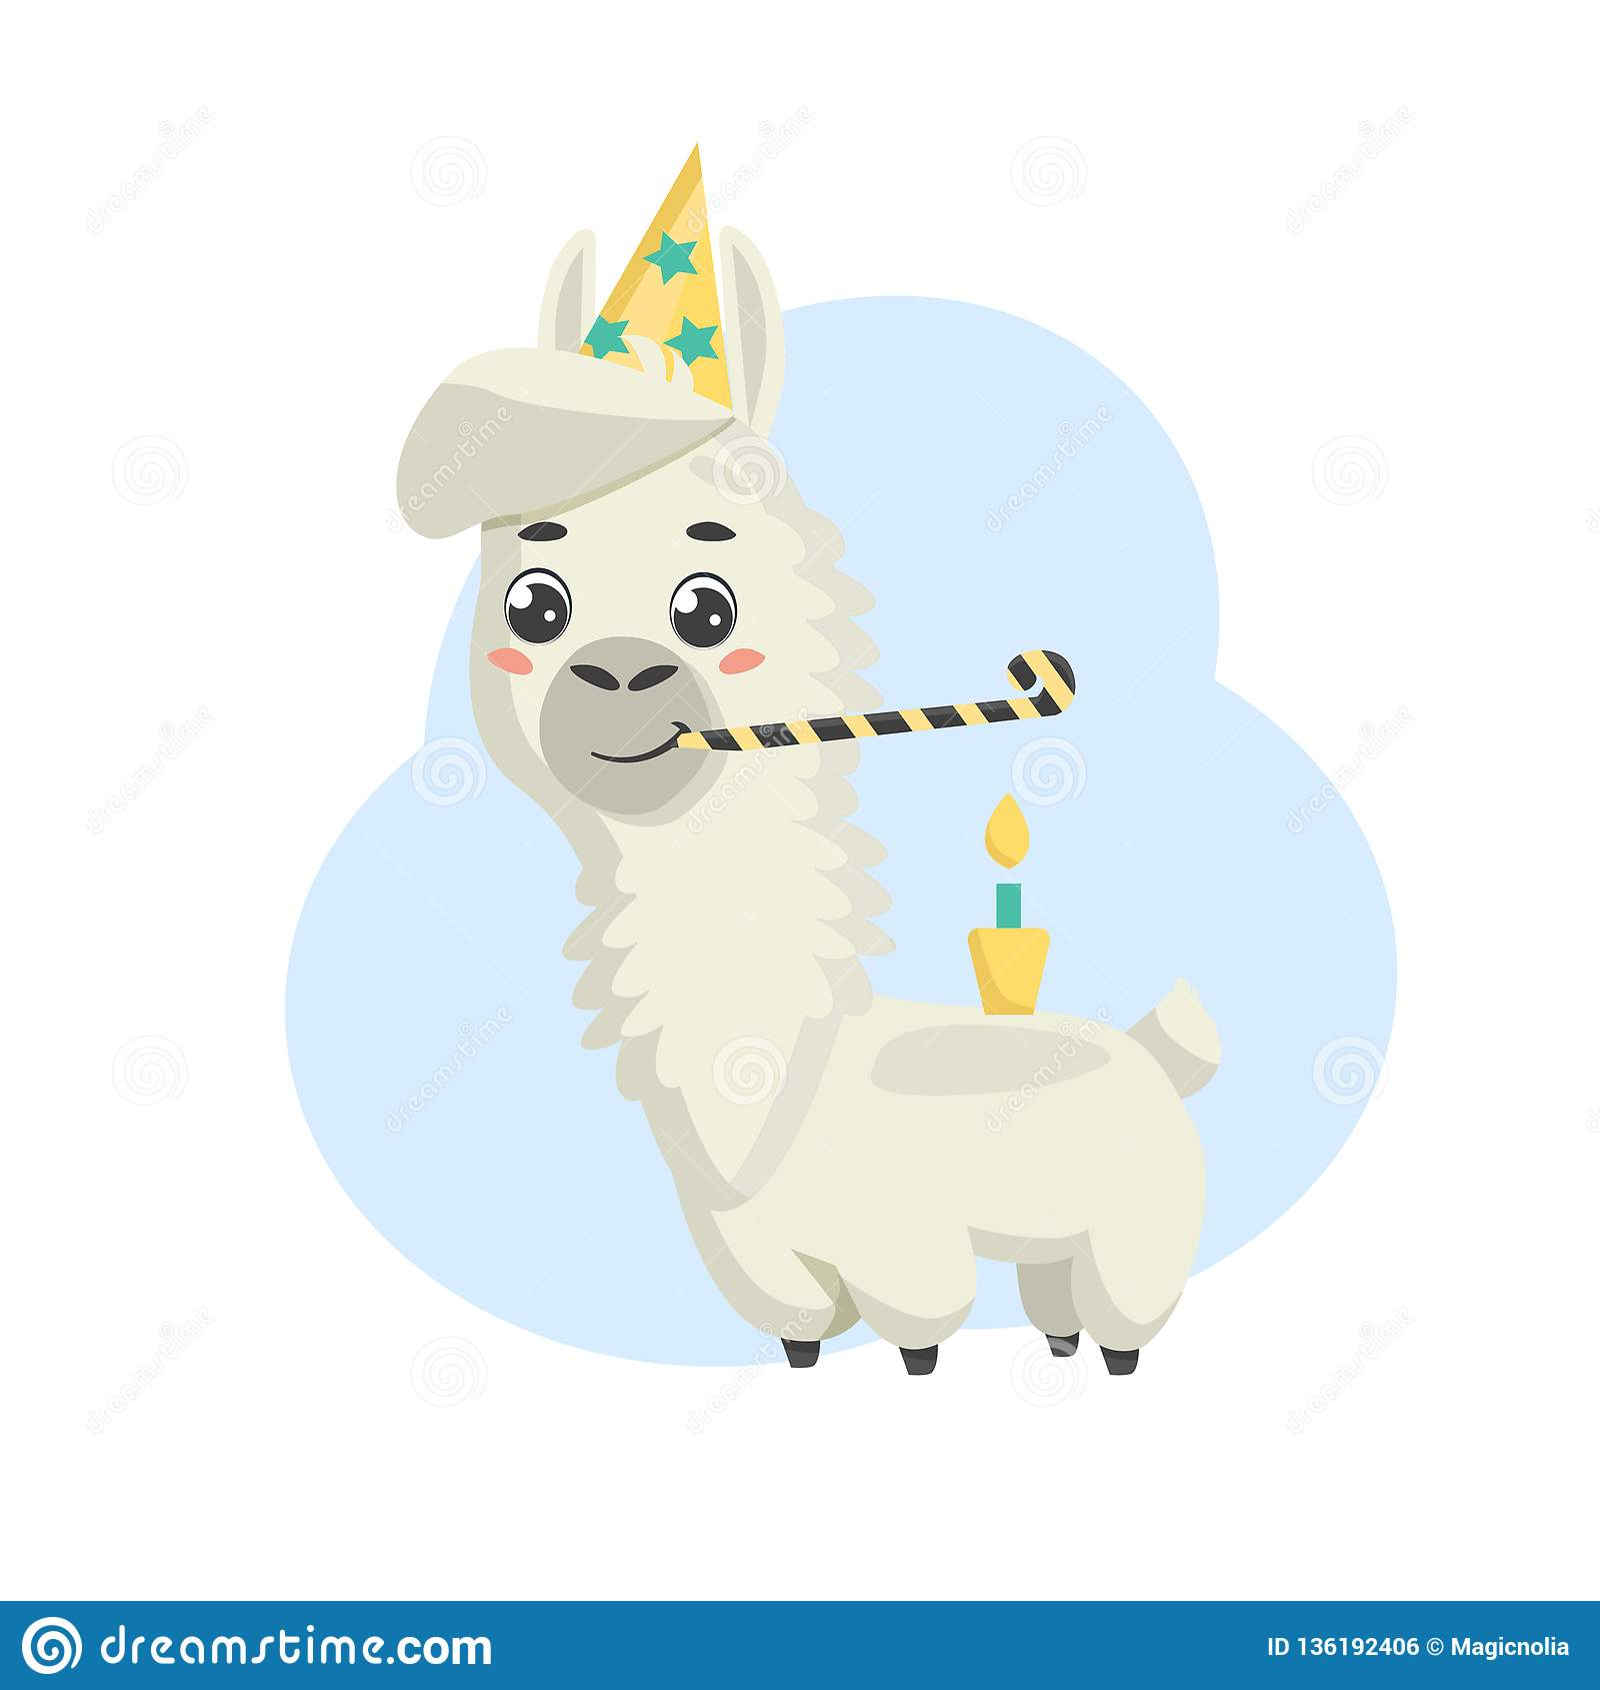 Happy Birthday Greeting Card With Celebrating Cute Cartoon Alpaca Cap Cake Candle